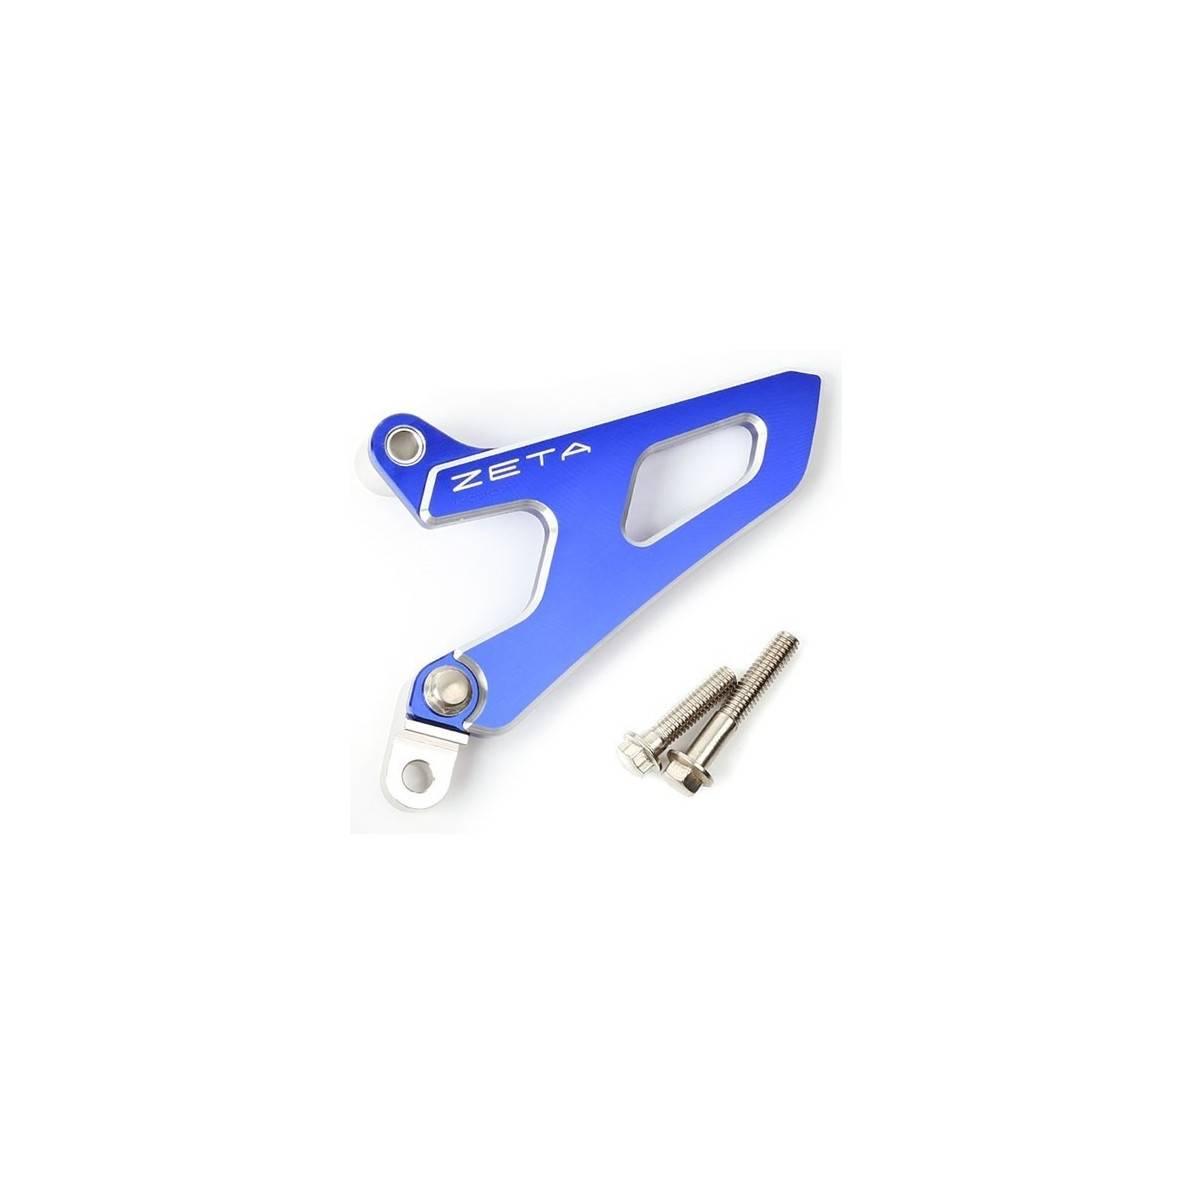 ZE80.9024 - Protector Piñon Salida Zeta Aluminio Yz Wr250F´01-, Rmz250´07-, Rmz450´05-Azul